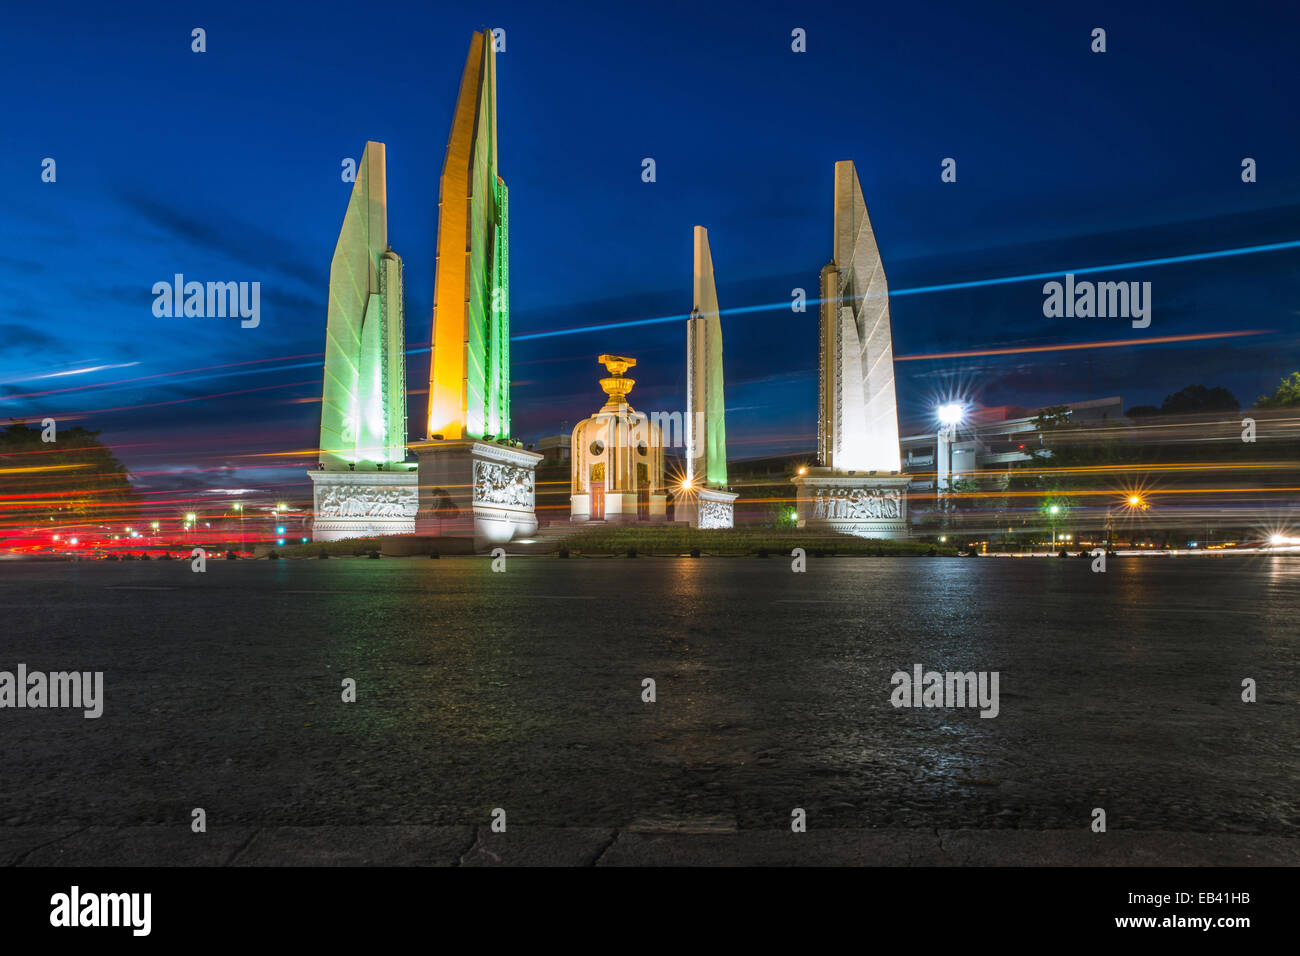 Democracy monument in Bangkok, Thailand - Stock Image